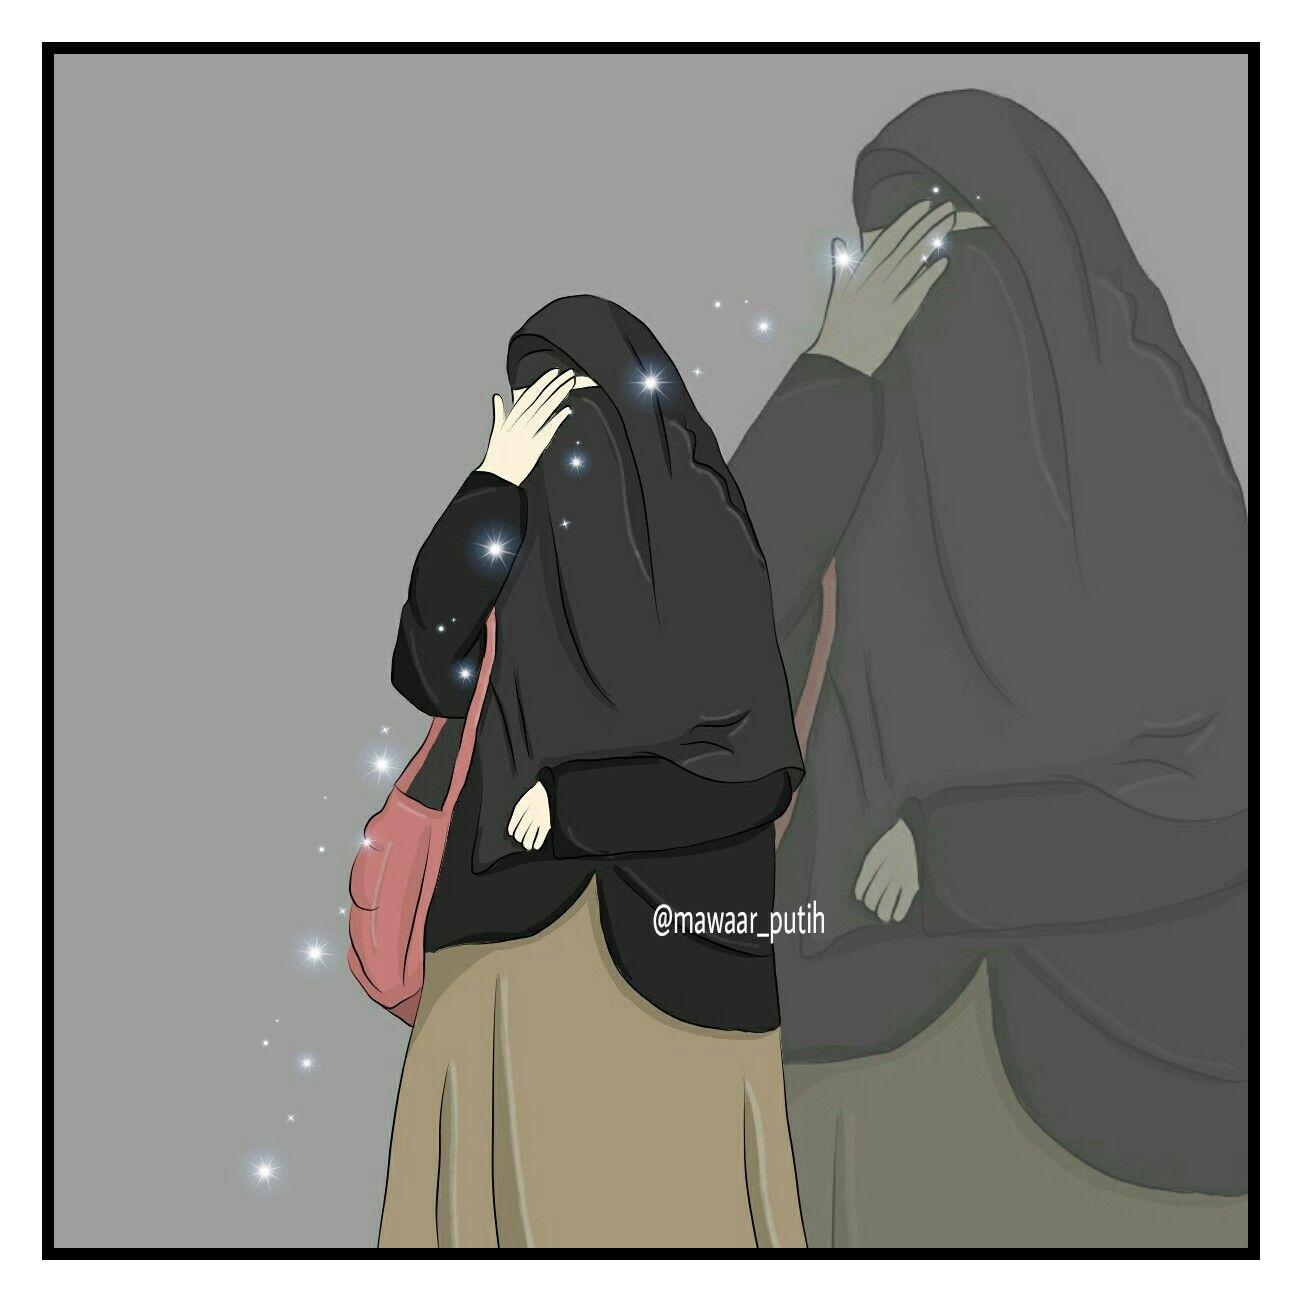 Love Hijab Hfz Anime Islami Pinterest Animation Gambar Kartun Muslimah